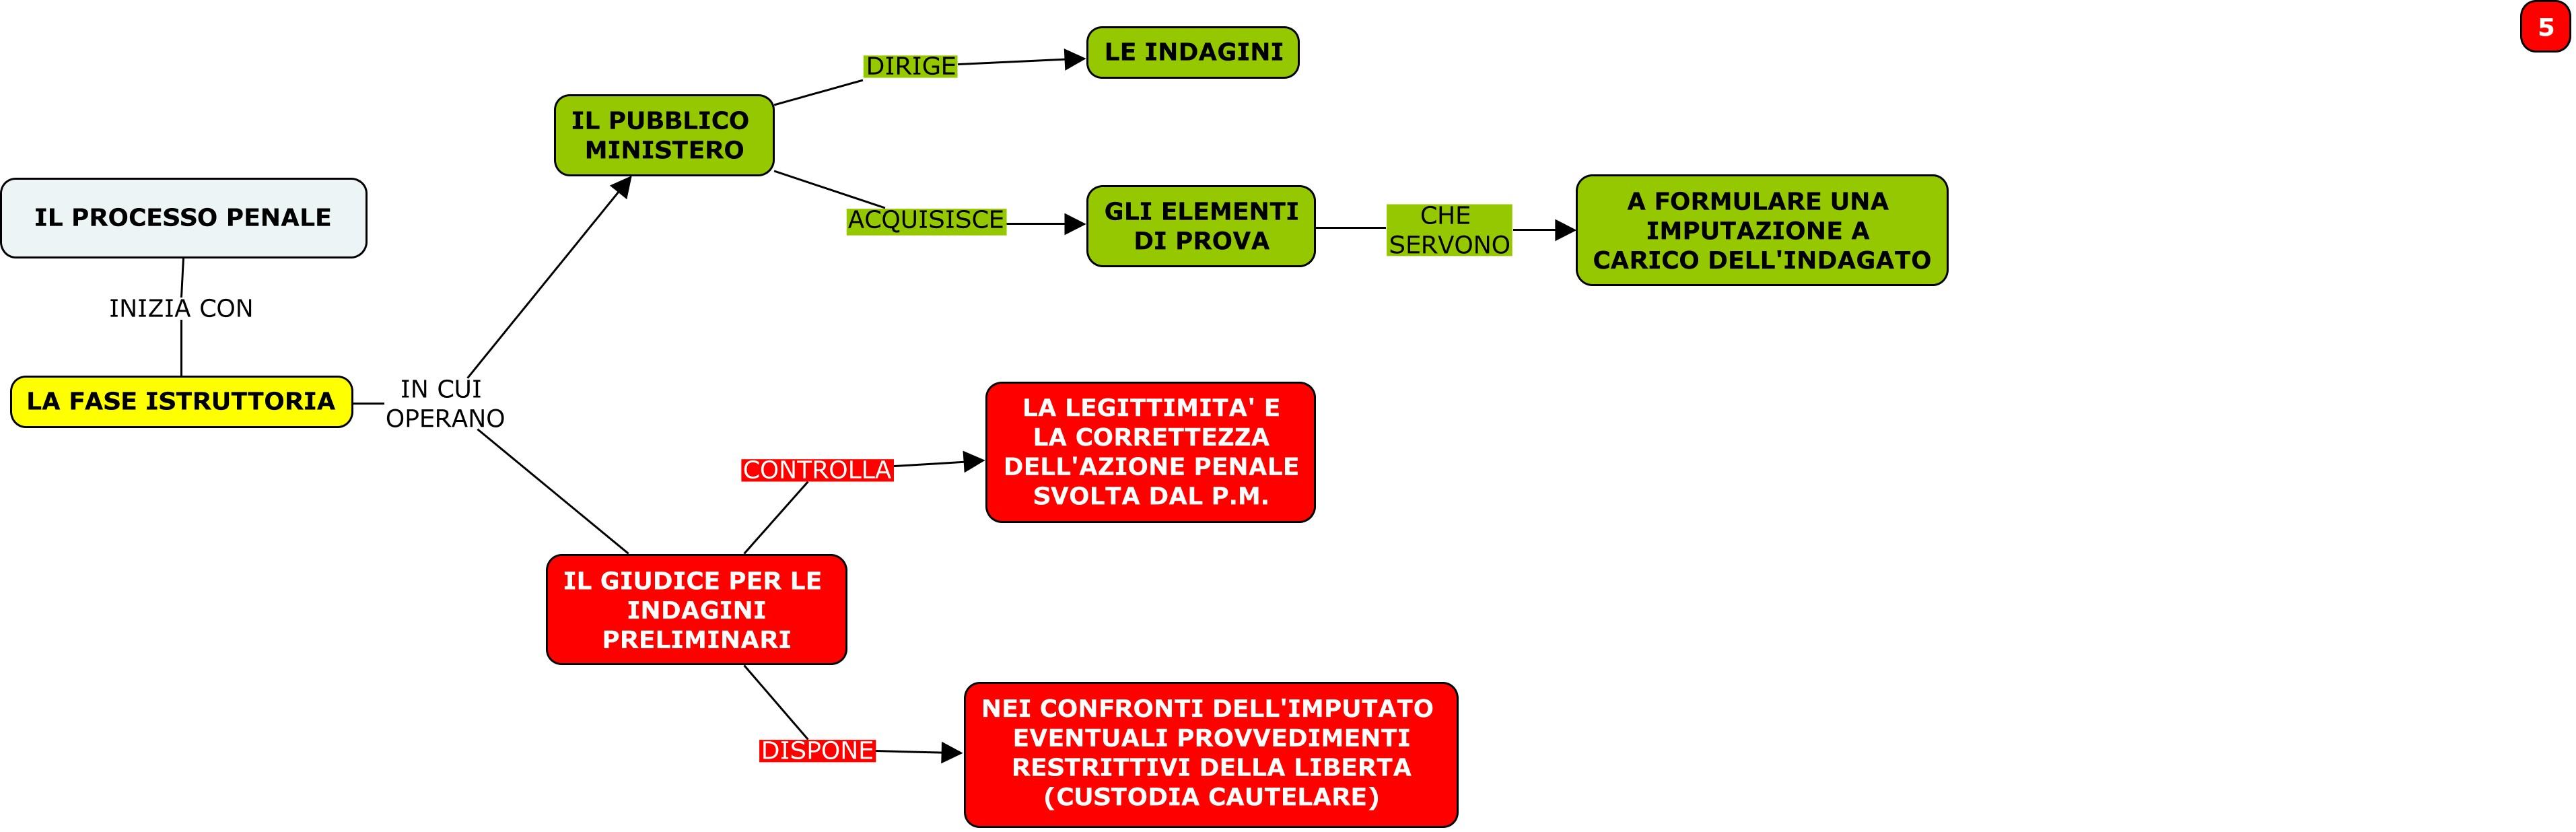 MAPPA 5